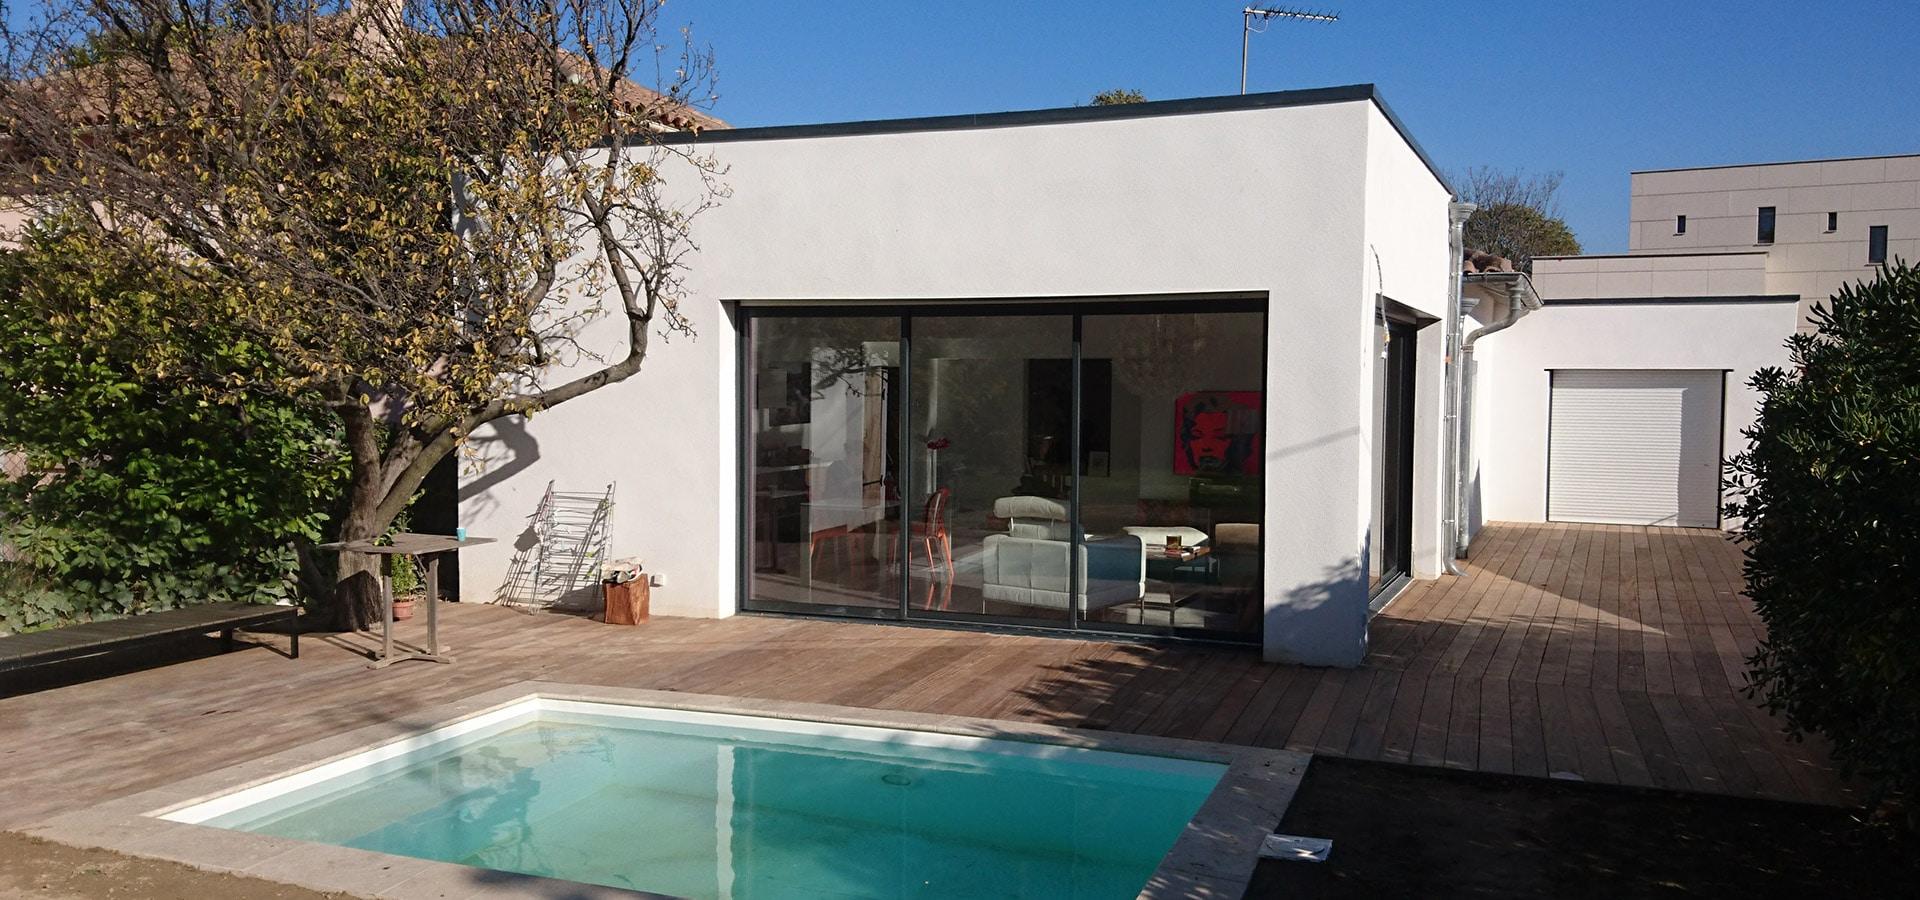 extension terrasse et piscine aix en provence. Black Bedroom Furniture Sets. Home Design Ideas